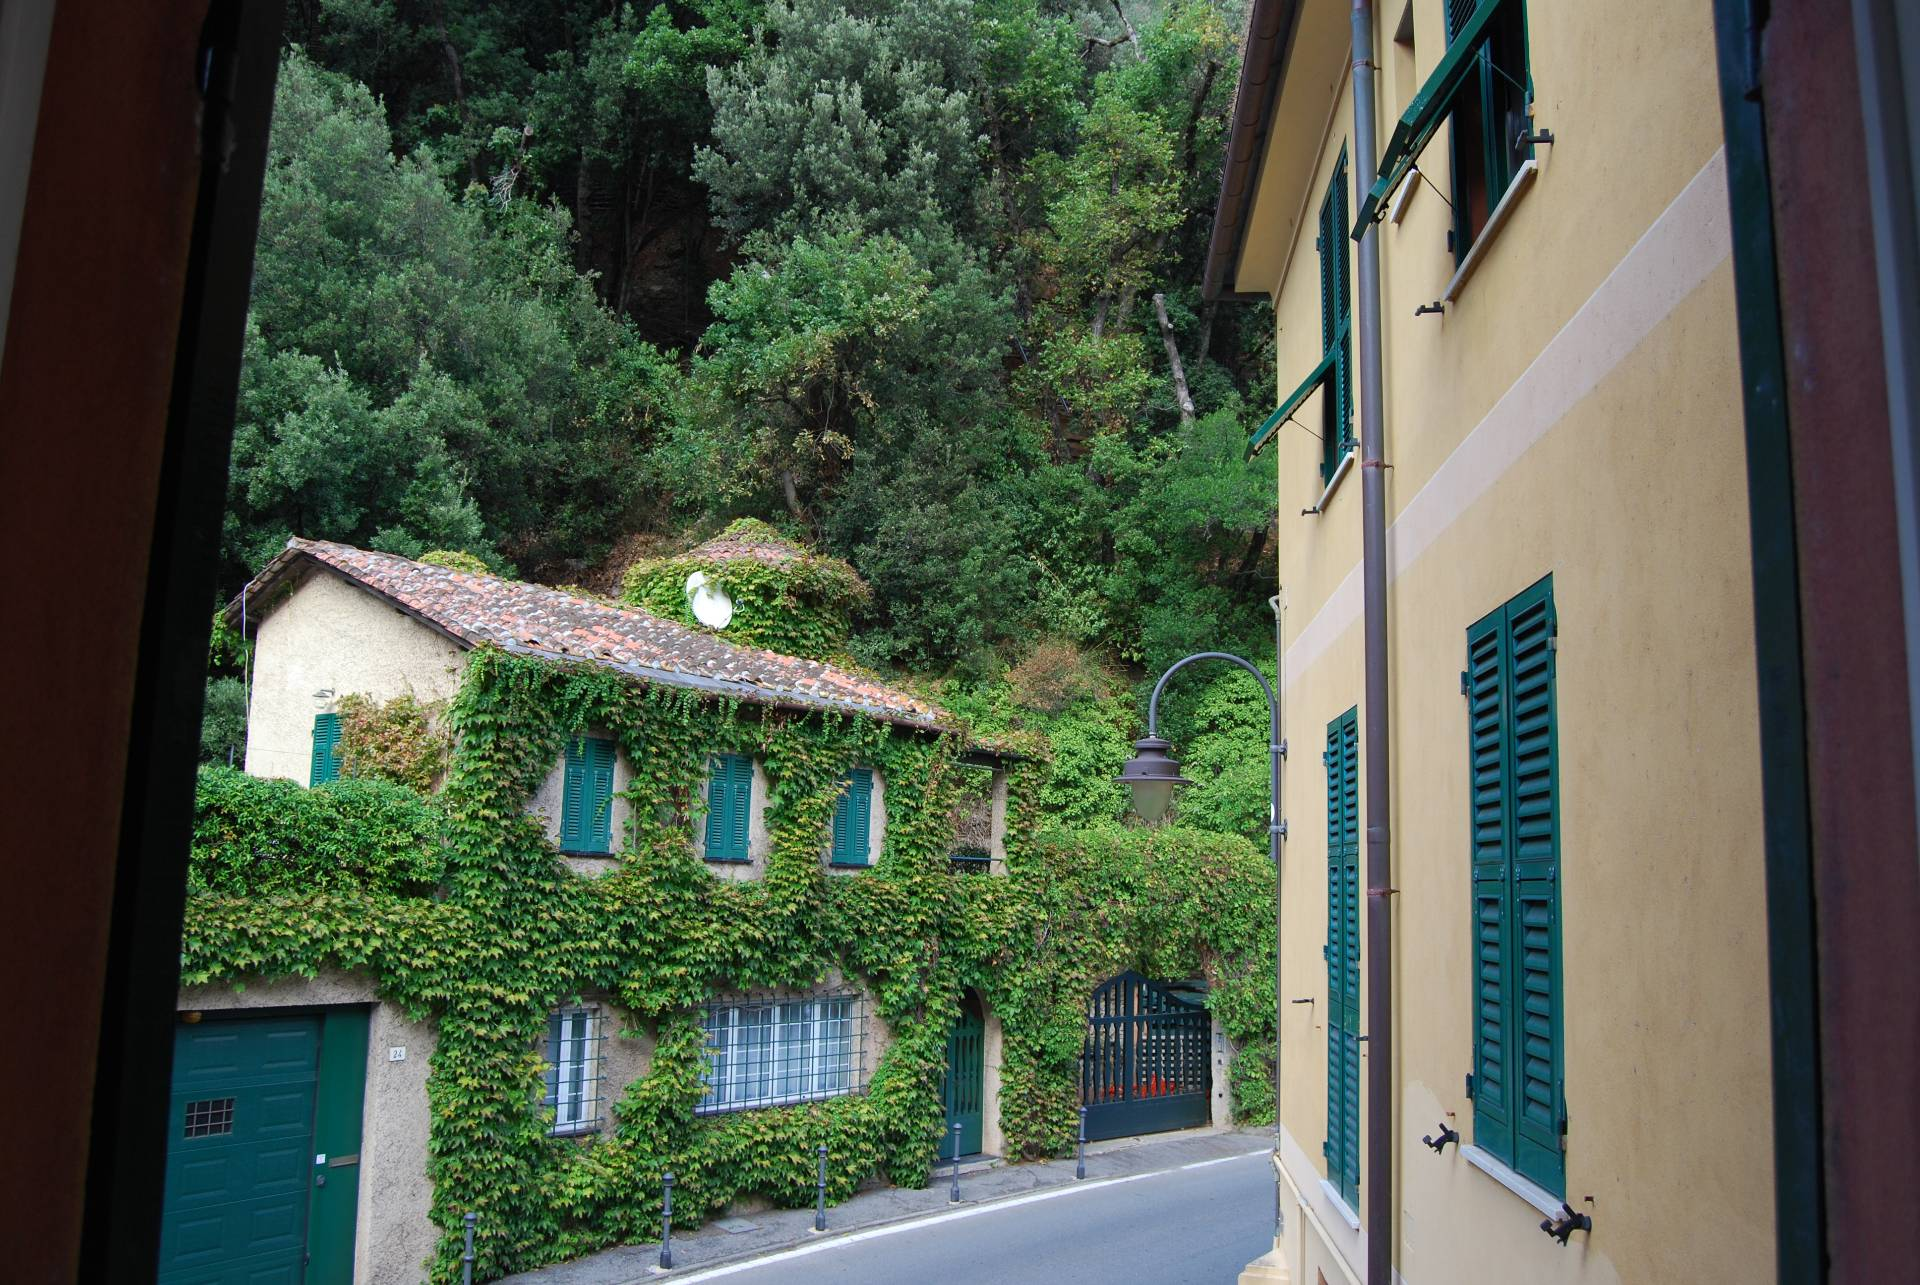 Bilocale Santa Margherita Ligure Via Paraggi A Monte 4